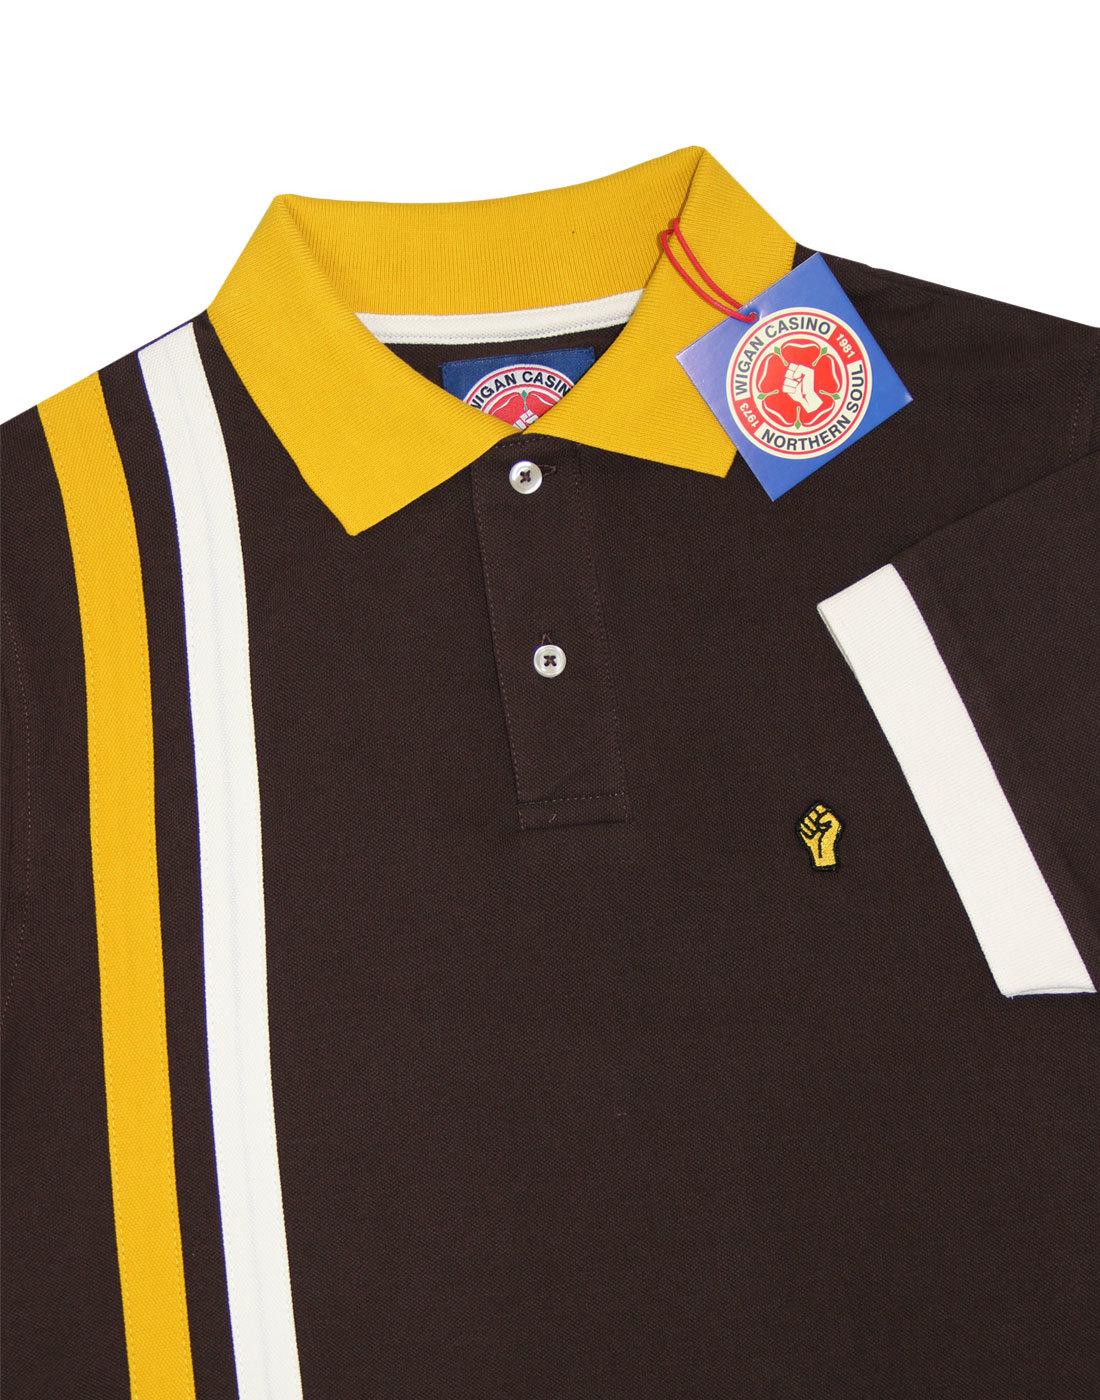 324c491f WIGAN CASINO Men's Mod Northern Soul Racing Stripe Polo in Brown